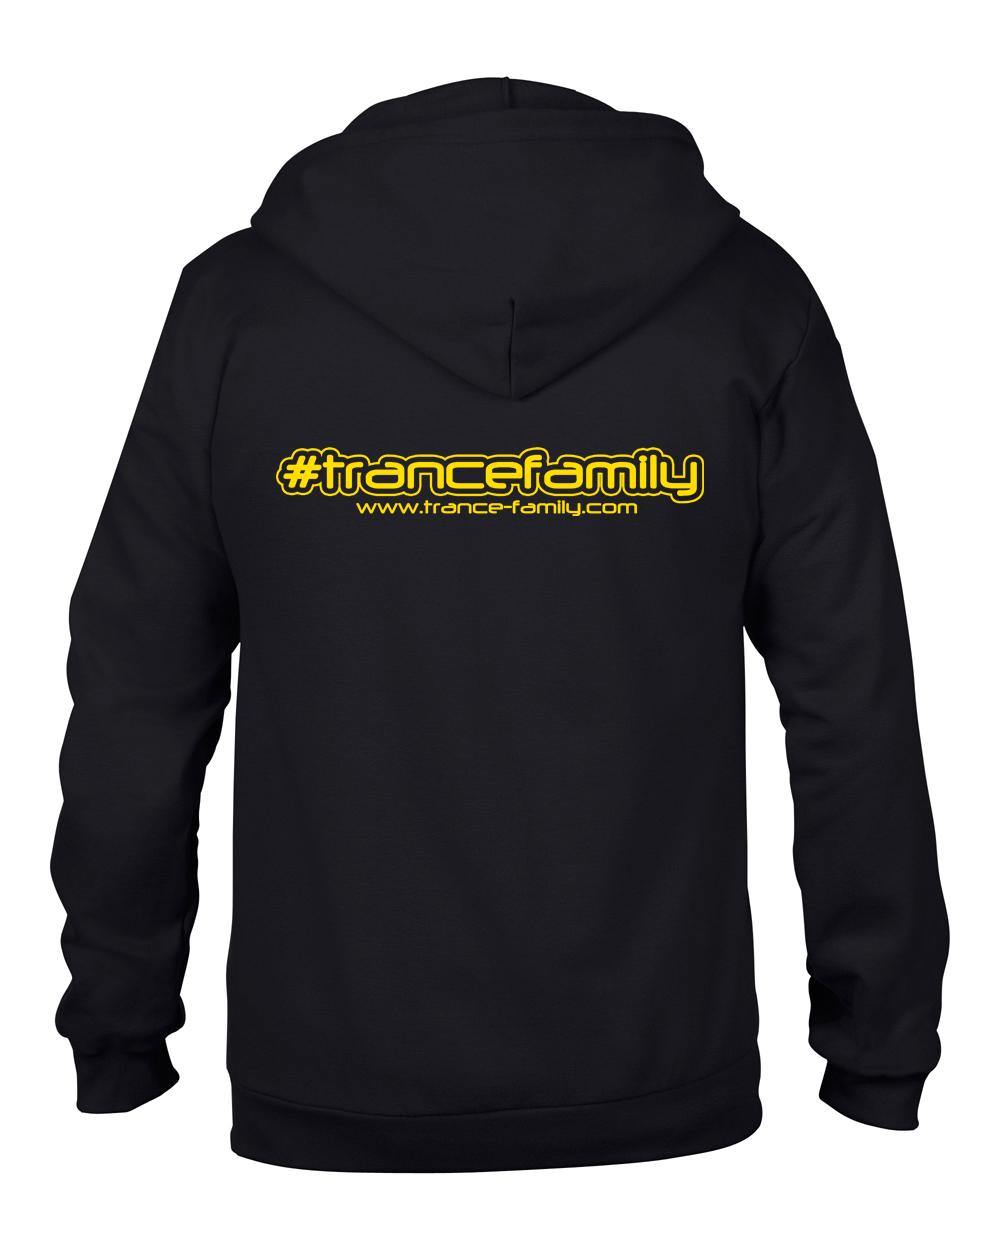 Trance-Family.com (#trancefamily Unisex Sweatjacket) M1-TFC  00082